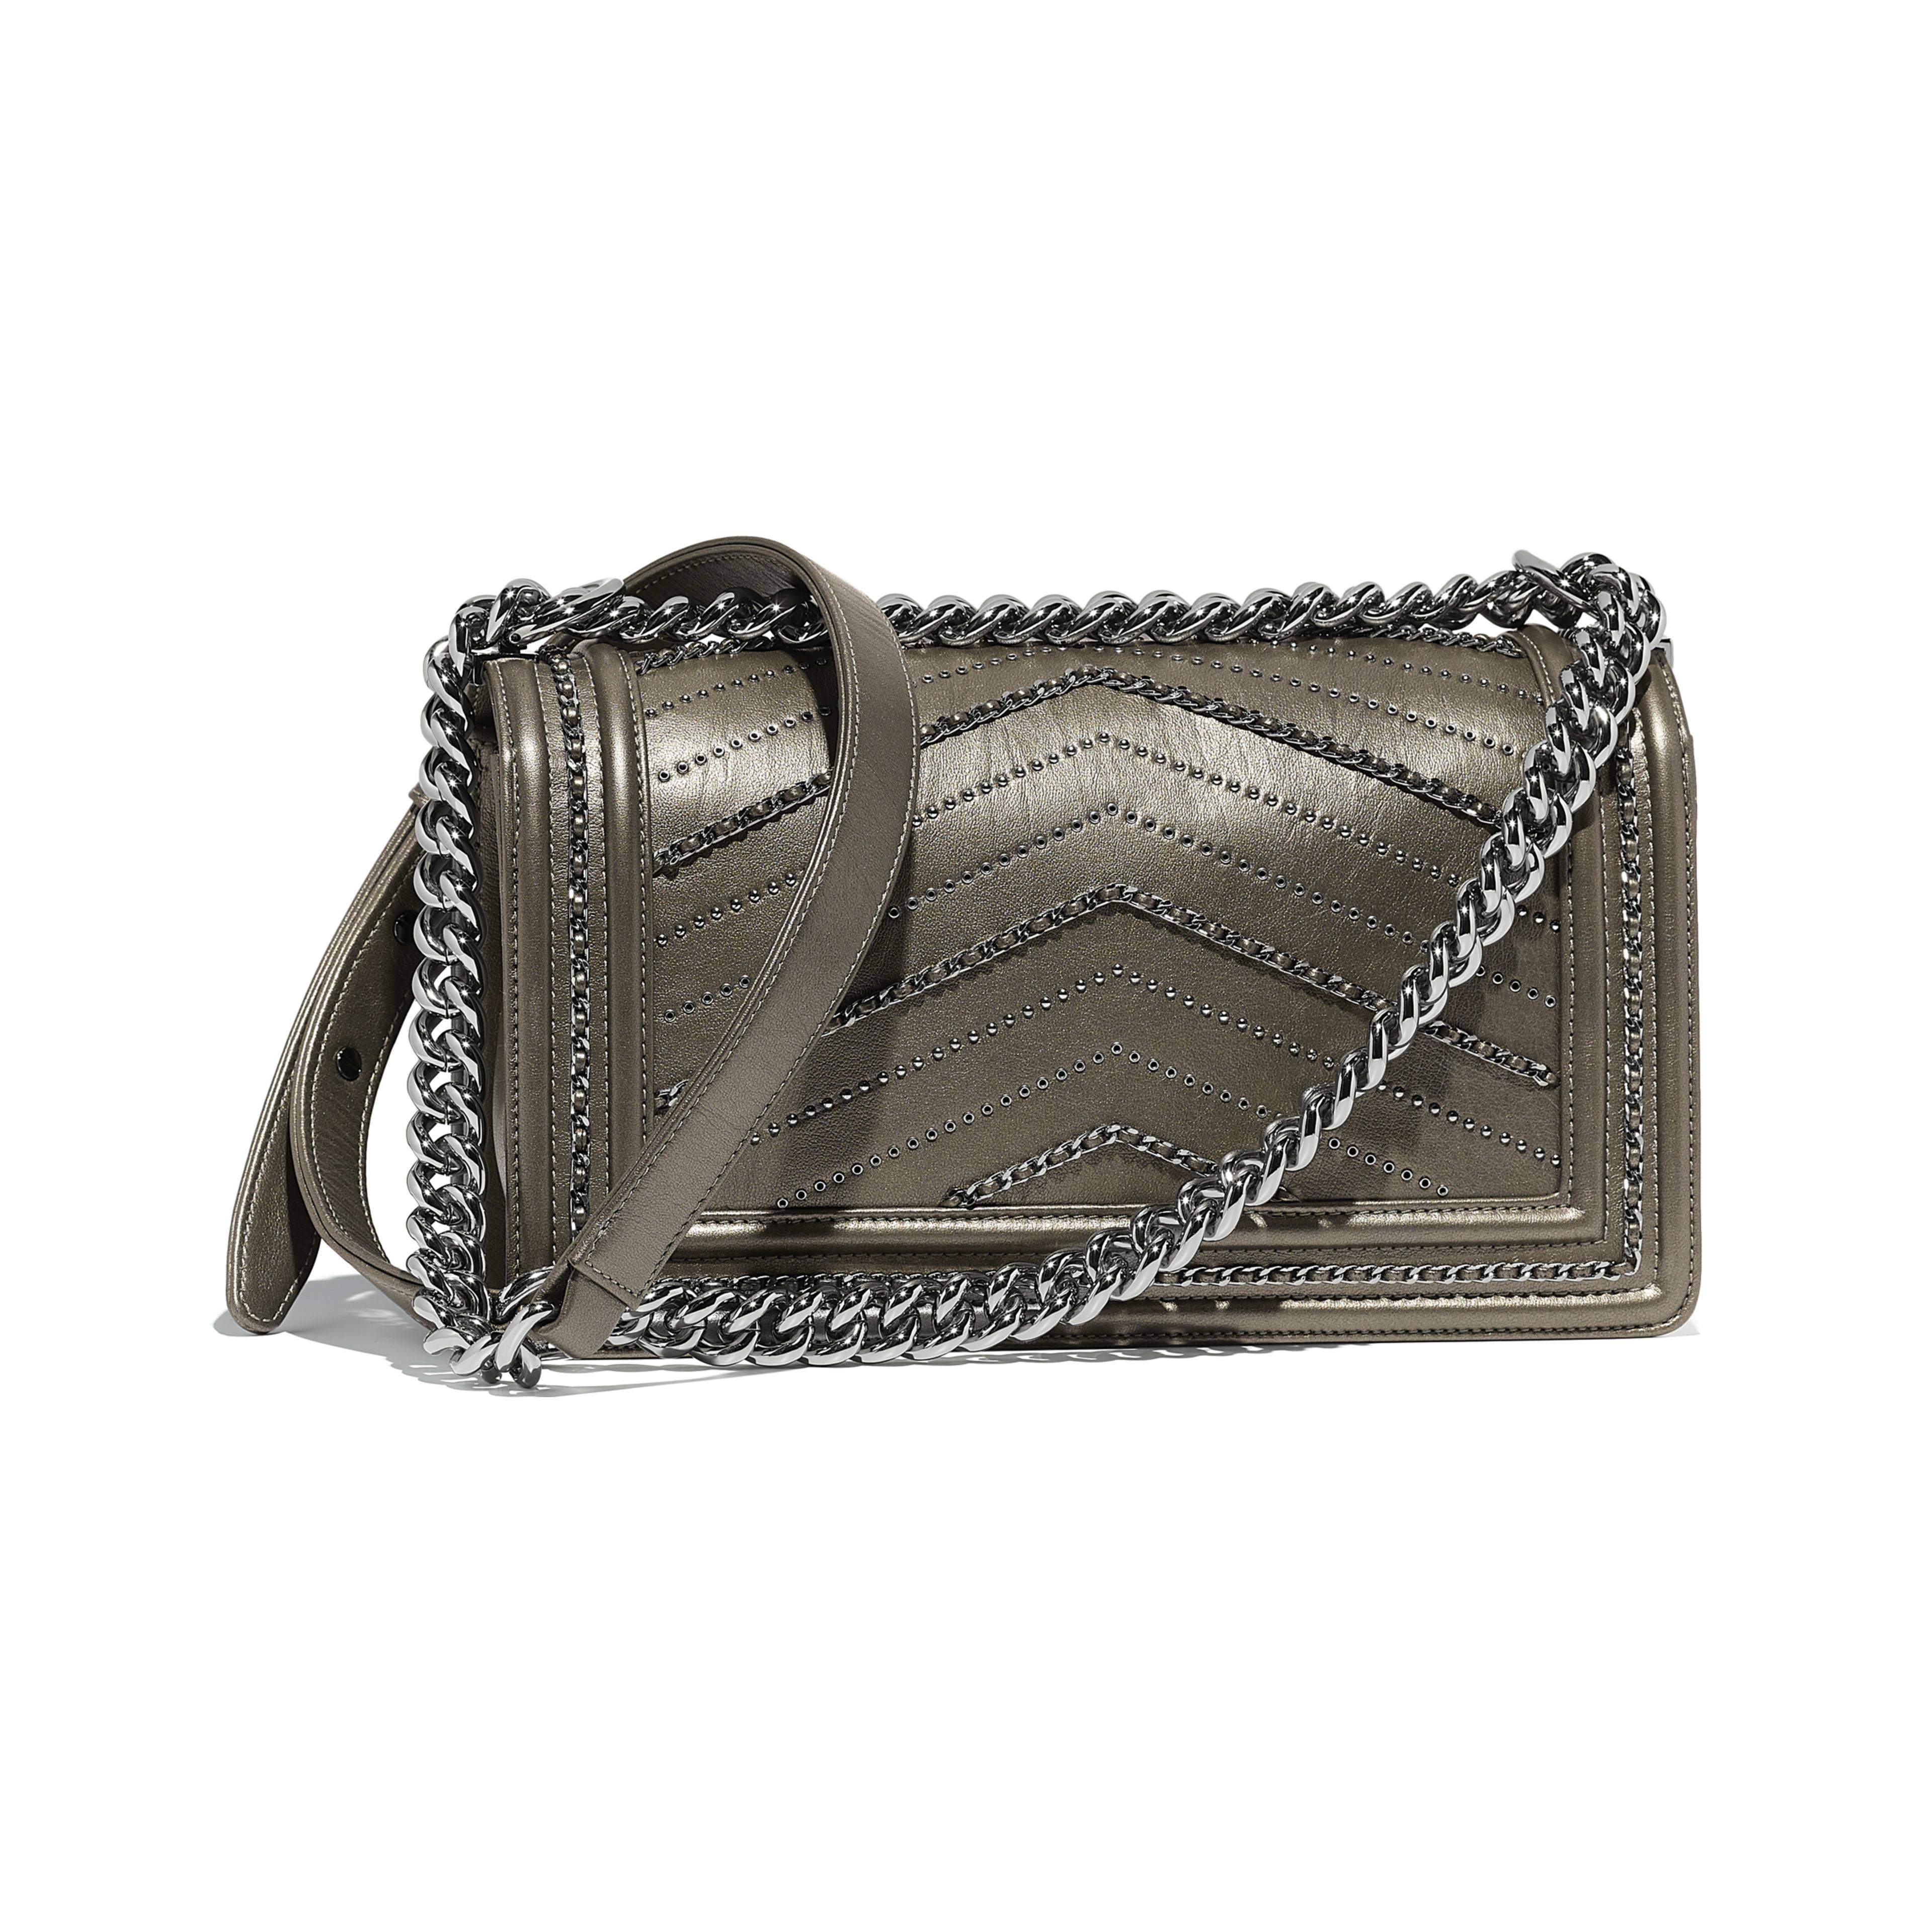 BOY CHANEL Handbag - Silver - Metallic Crumpled Calfskin & Ruthenium-Finish Metal - Alternative view - see full sized version